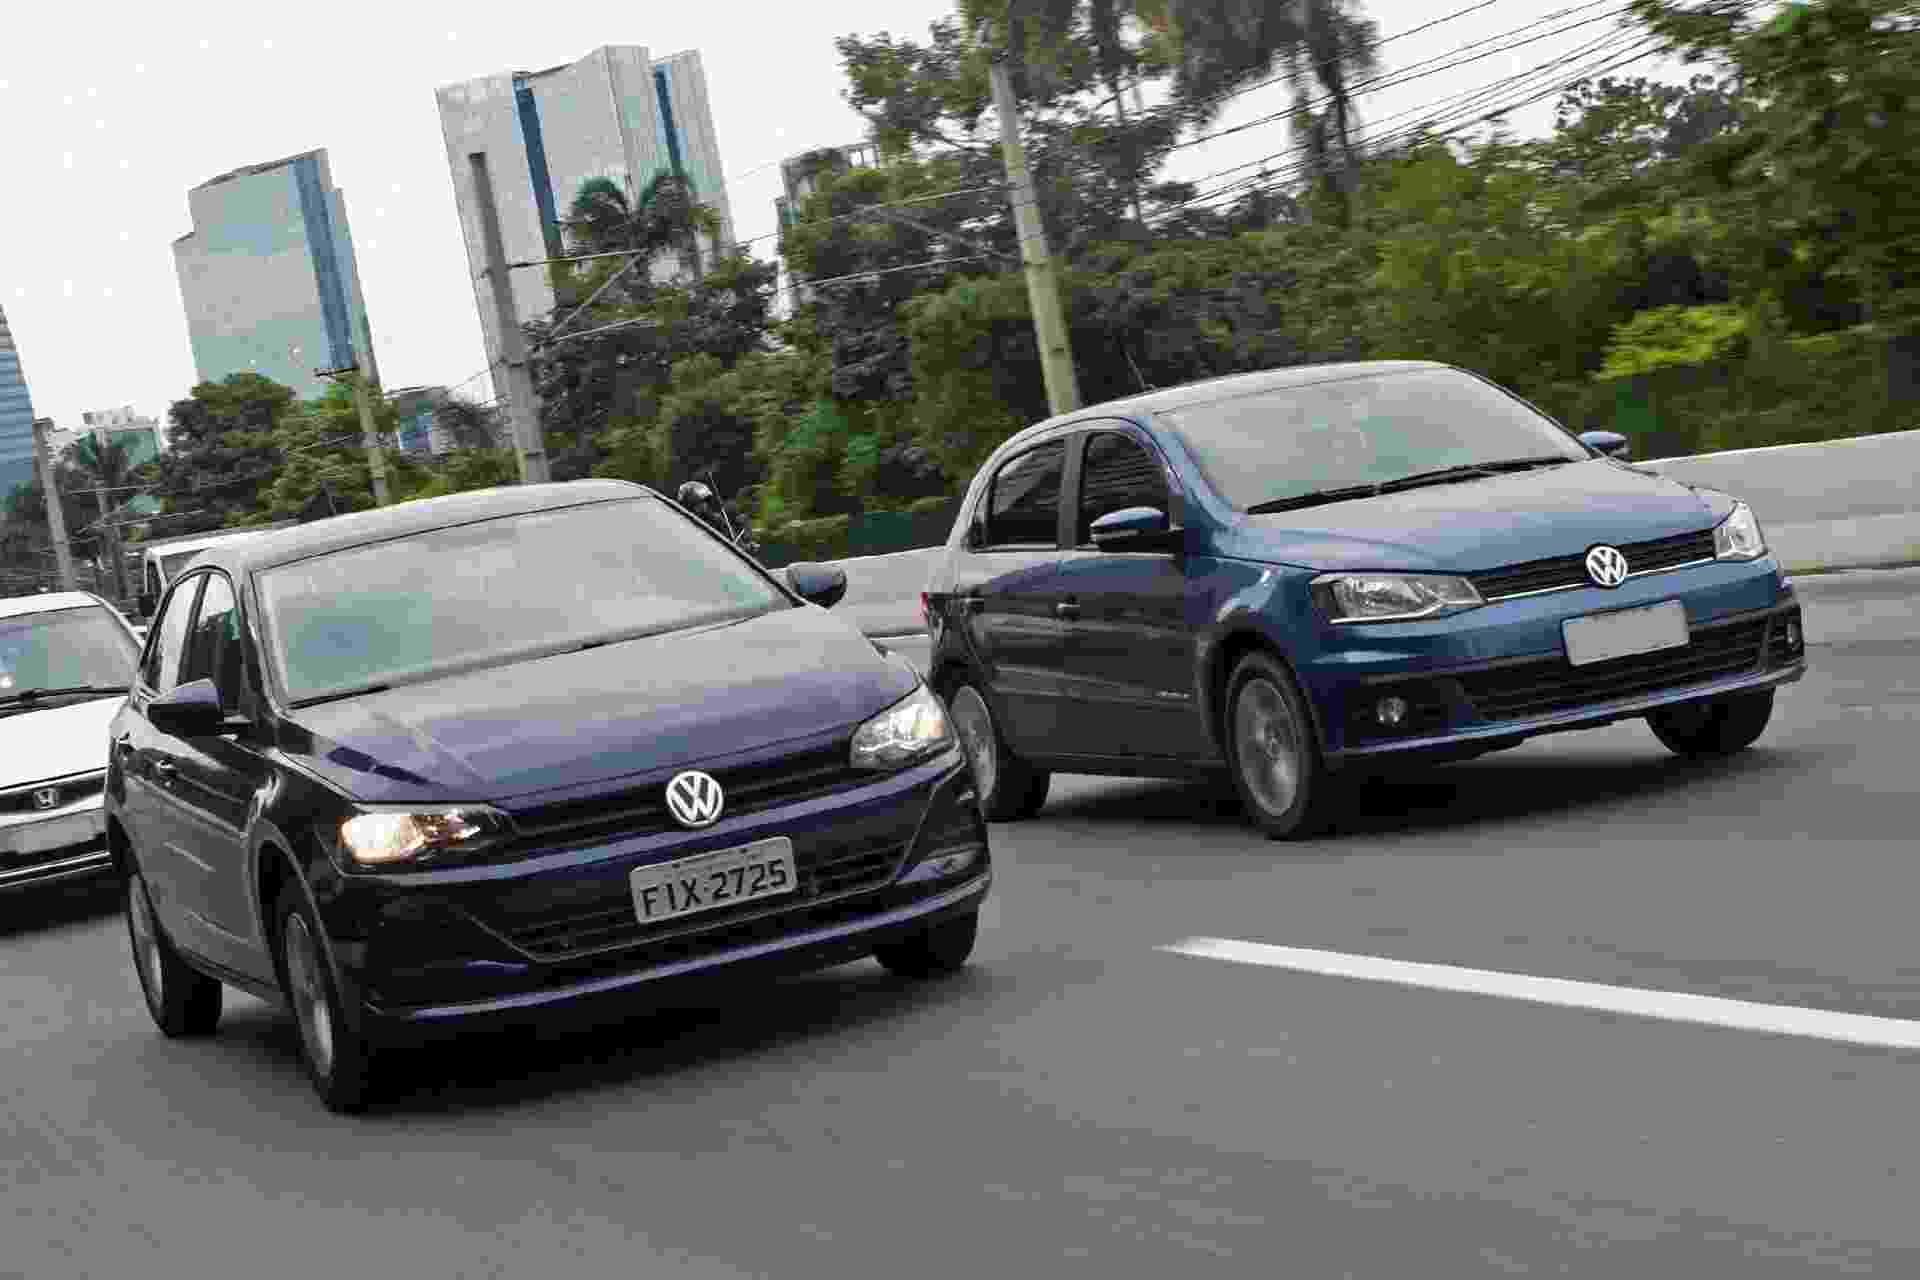 Volkswagen Polo 1.0 MPI - Murilo Góes/UOL